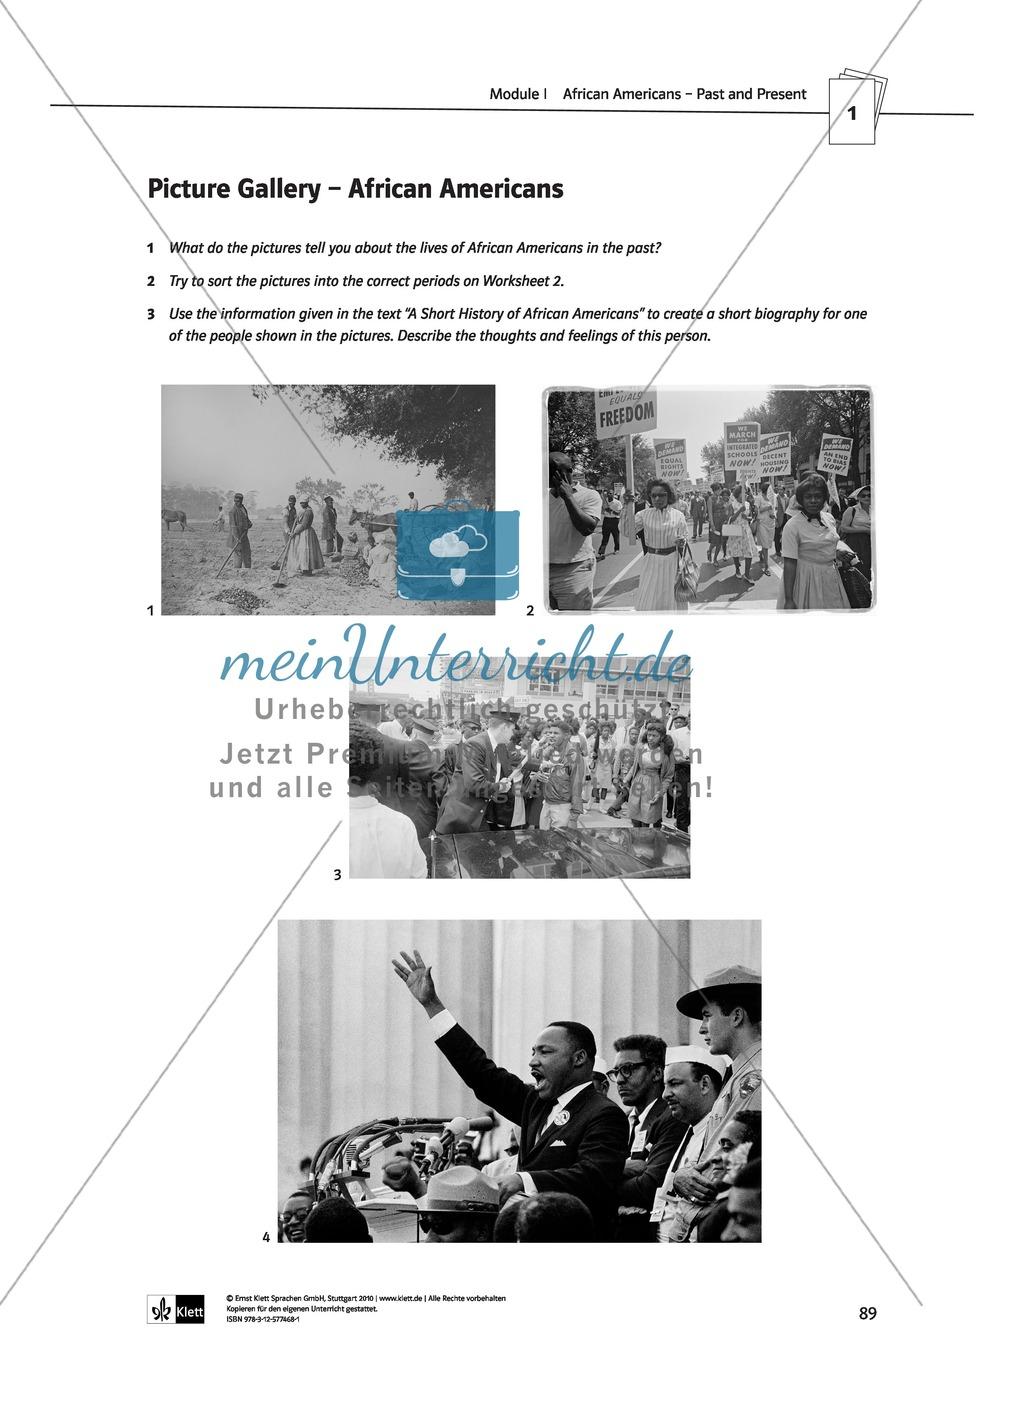 African Americans - Past and Present: Geschichte + Lernziele + Arbeitsblätter + Lösungen Preview 8